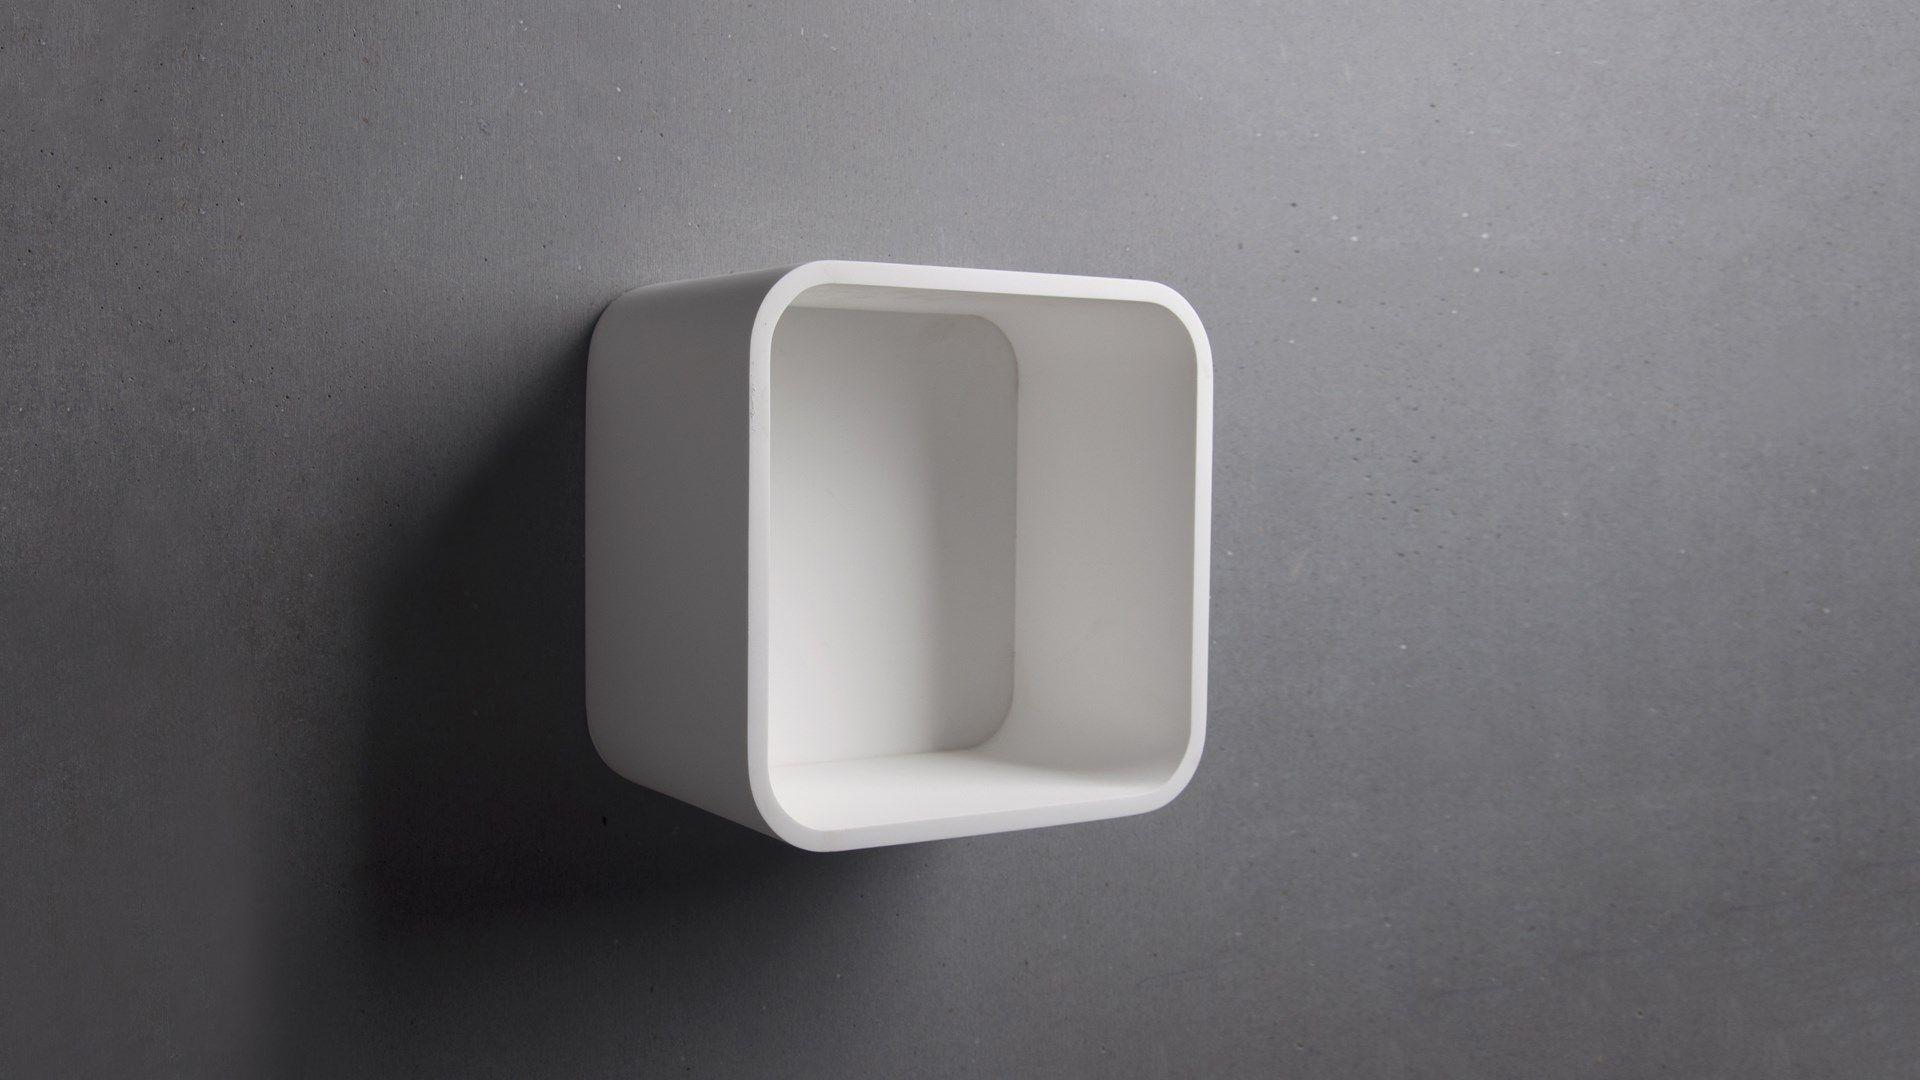 SSI Design Barnstaple badkamerkast Solid Surface 30x30x20cm